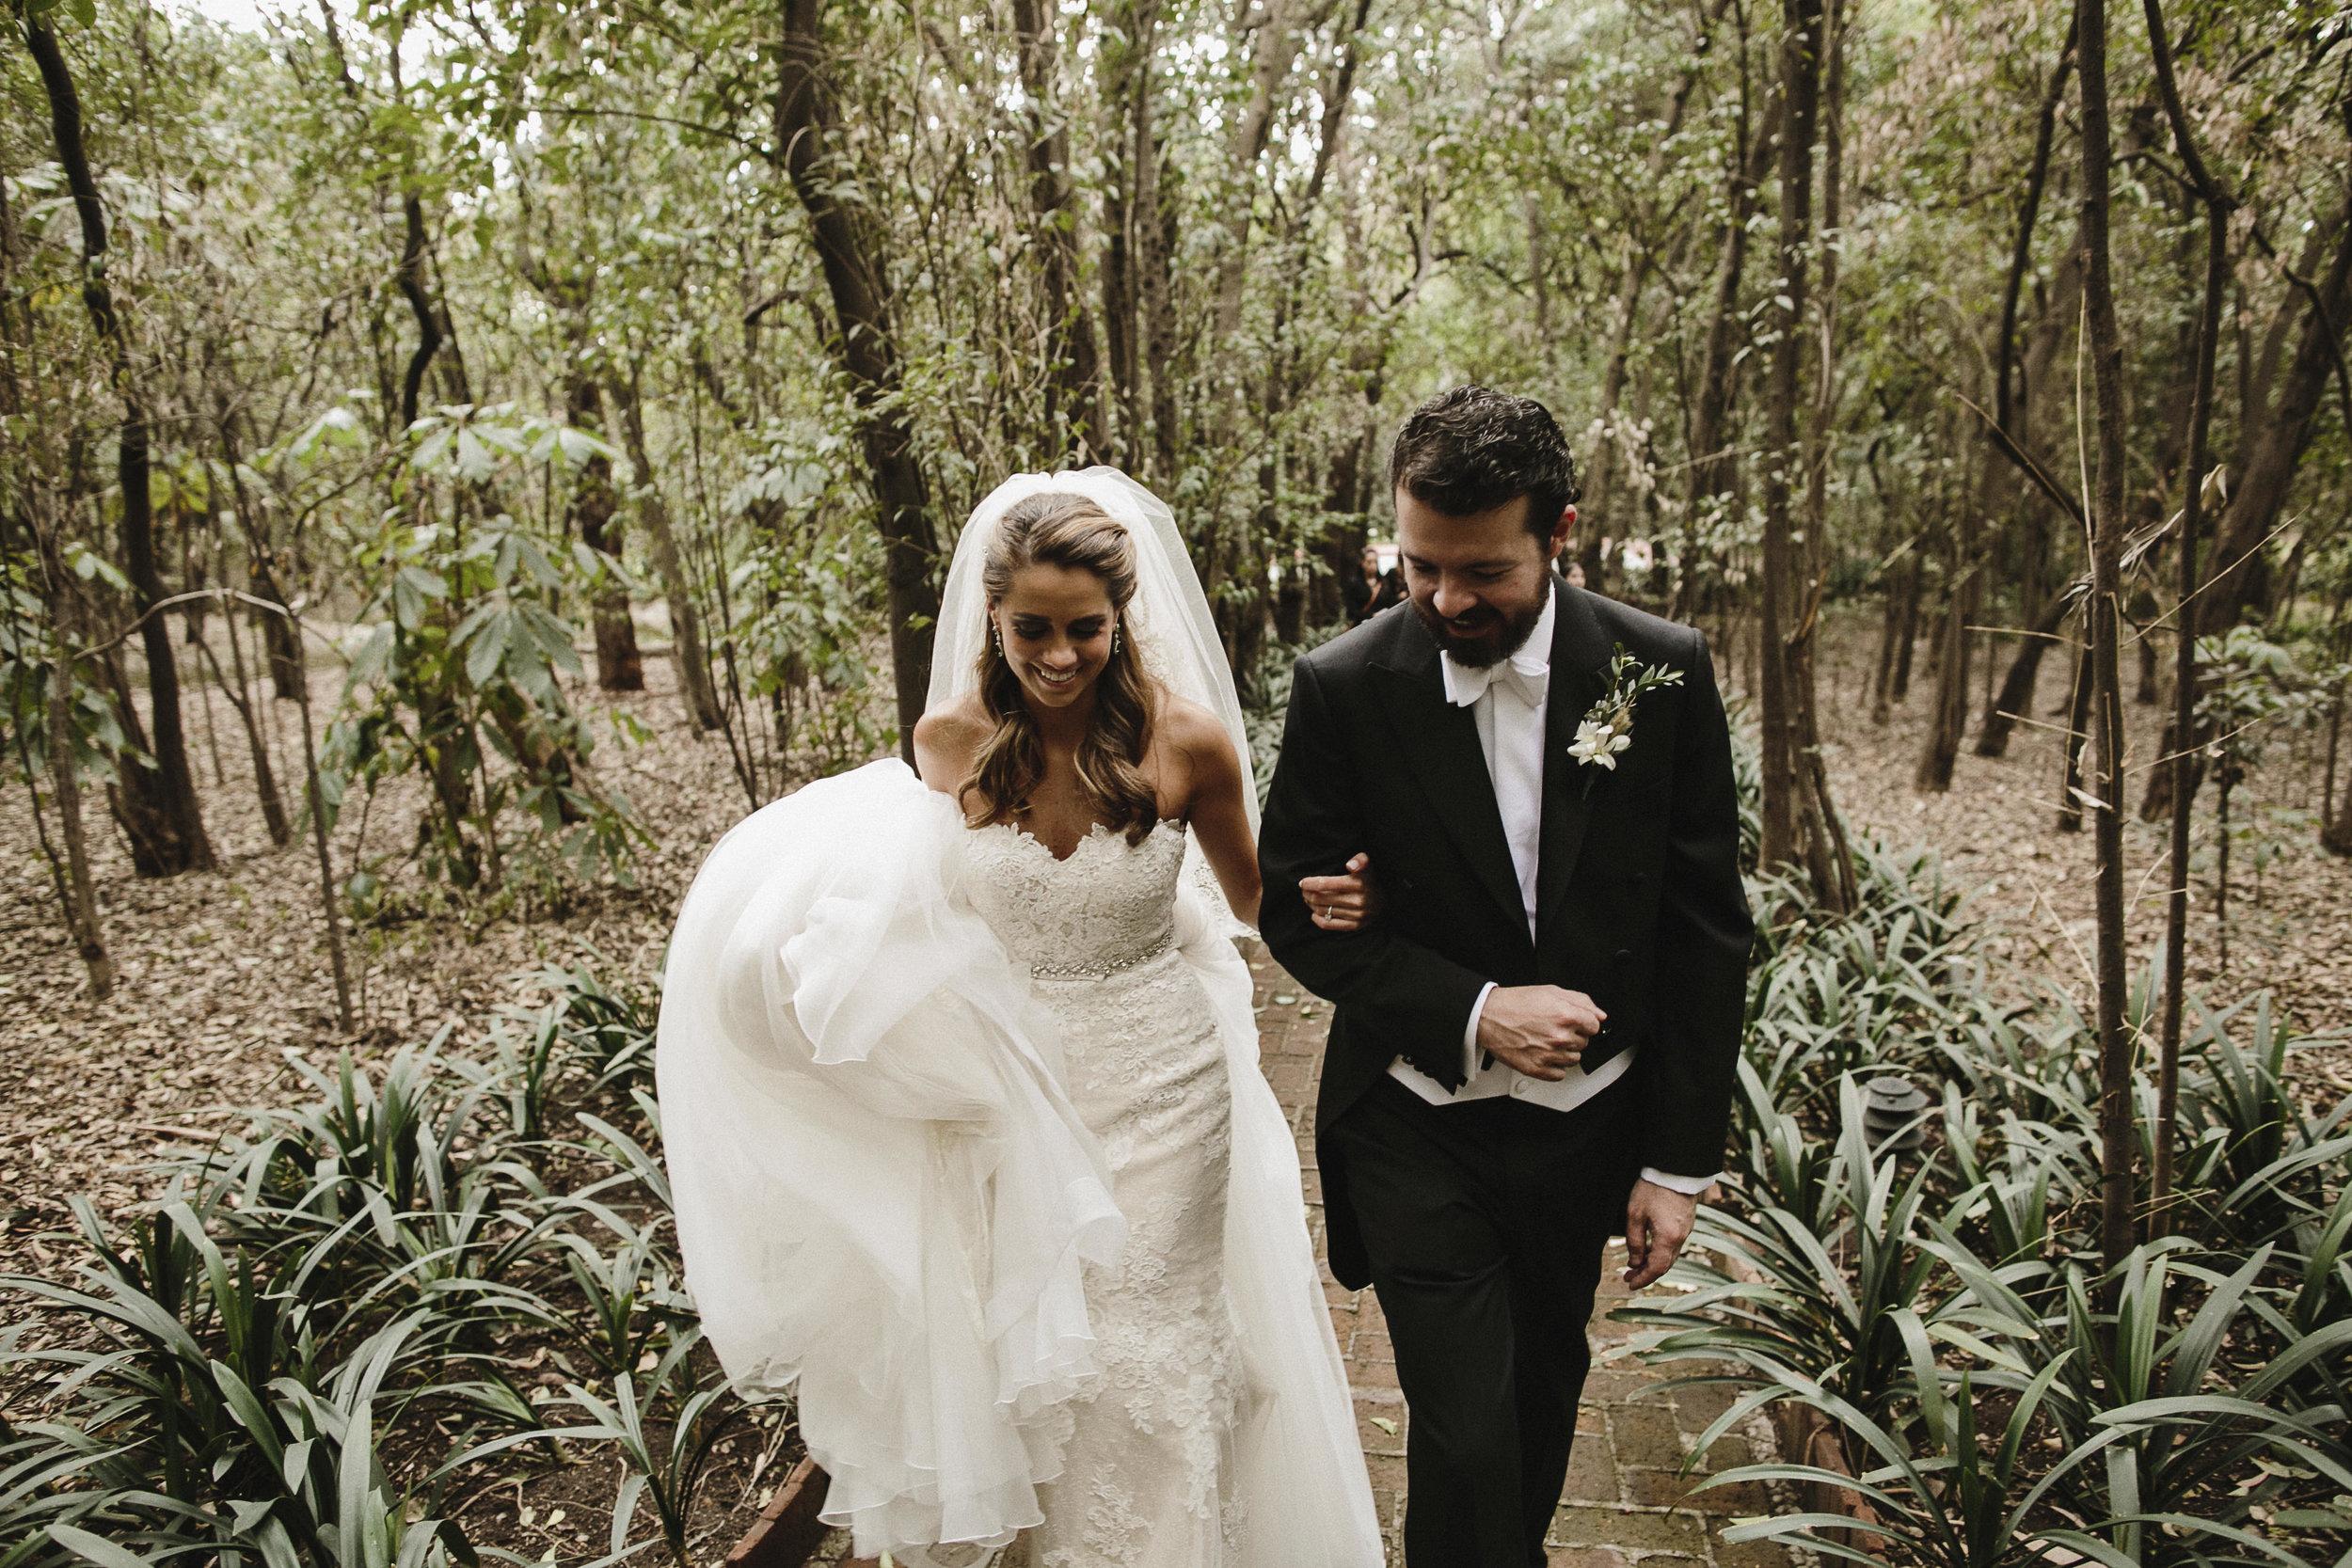 alfonso_flores_destination_wedding_photogrpahy_paola_alonso-248.JPG